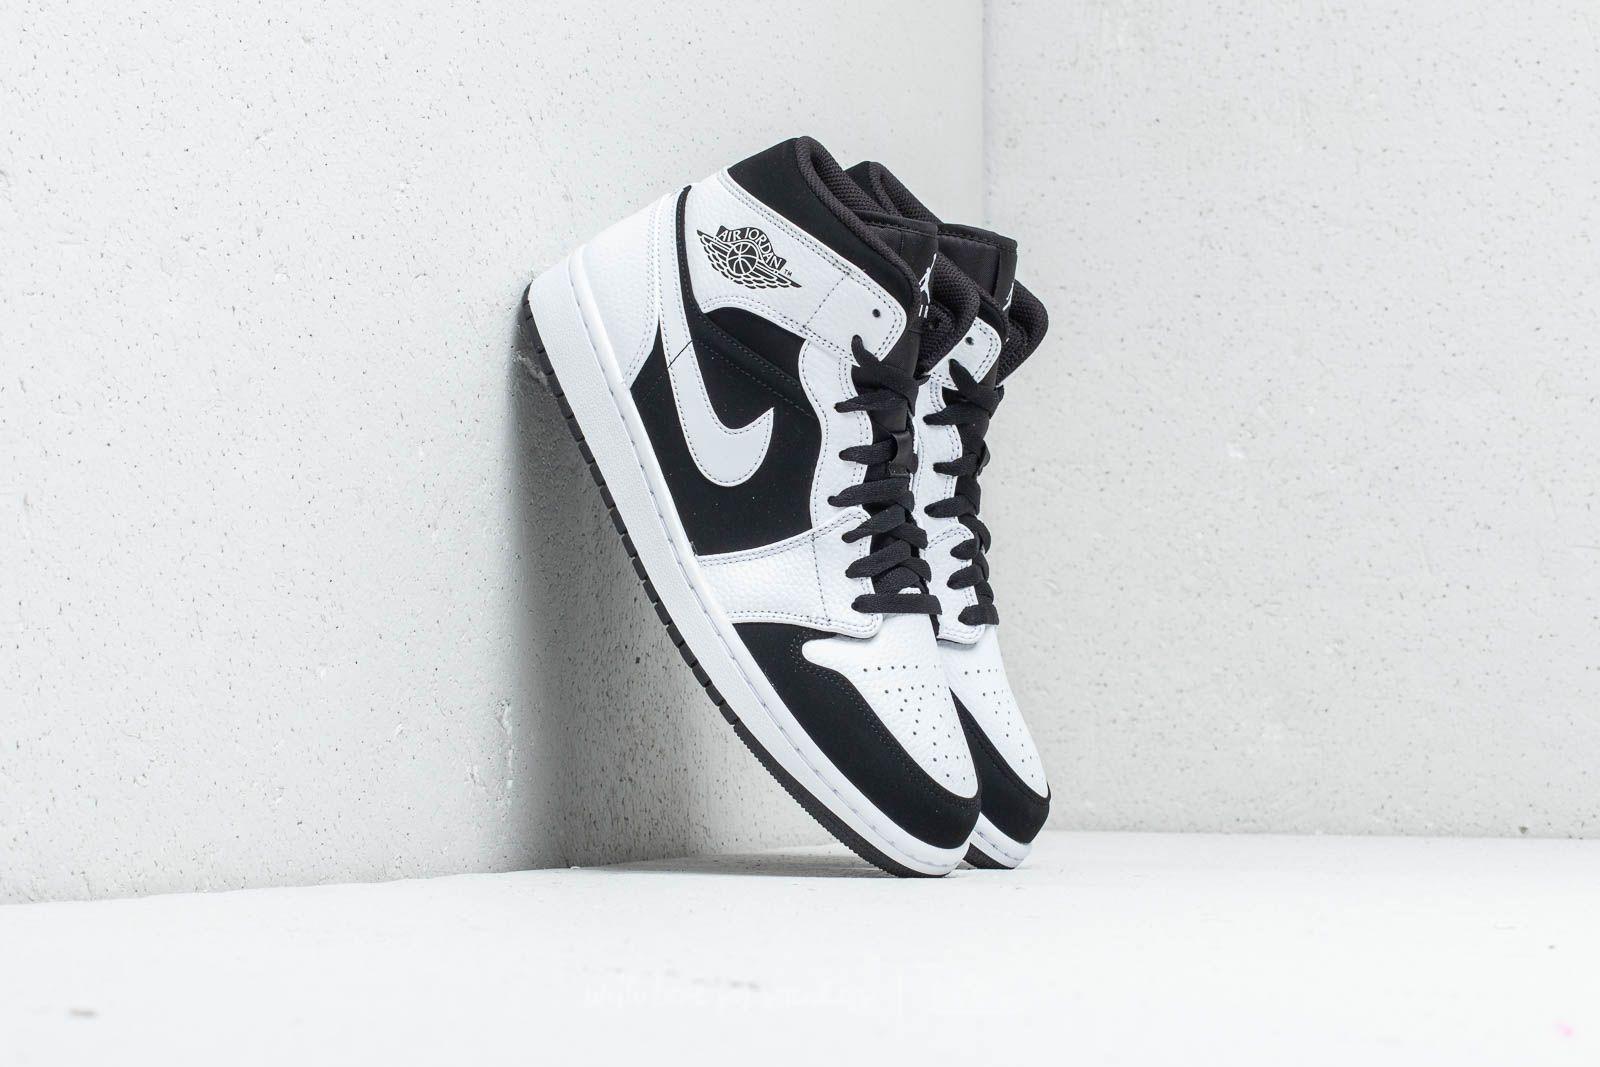 cheaper e463f 58e23 Air Jordan 1 Mid